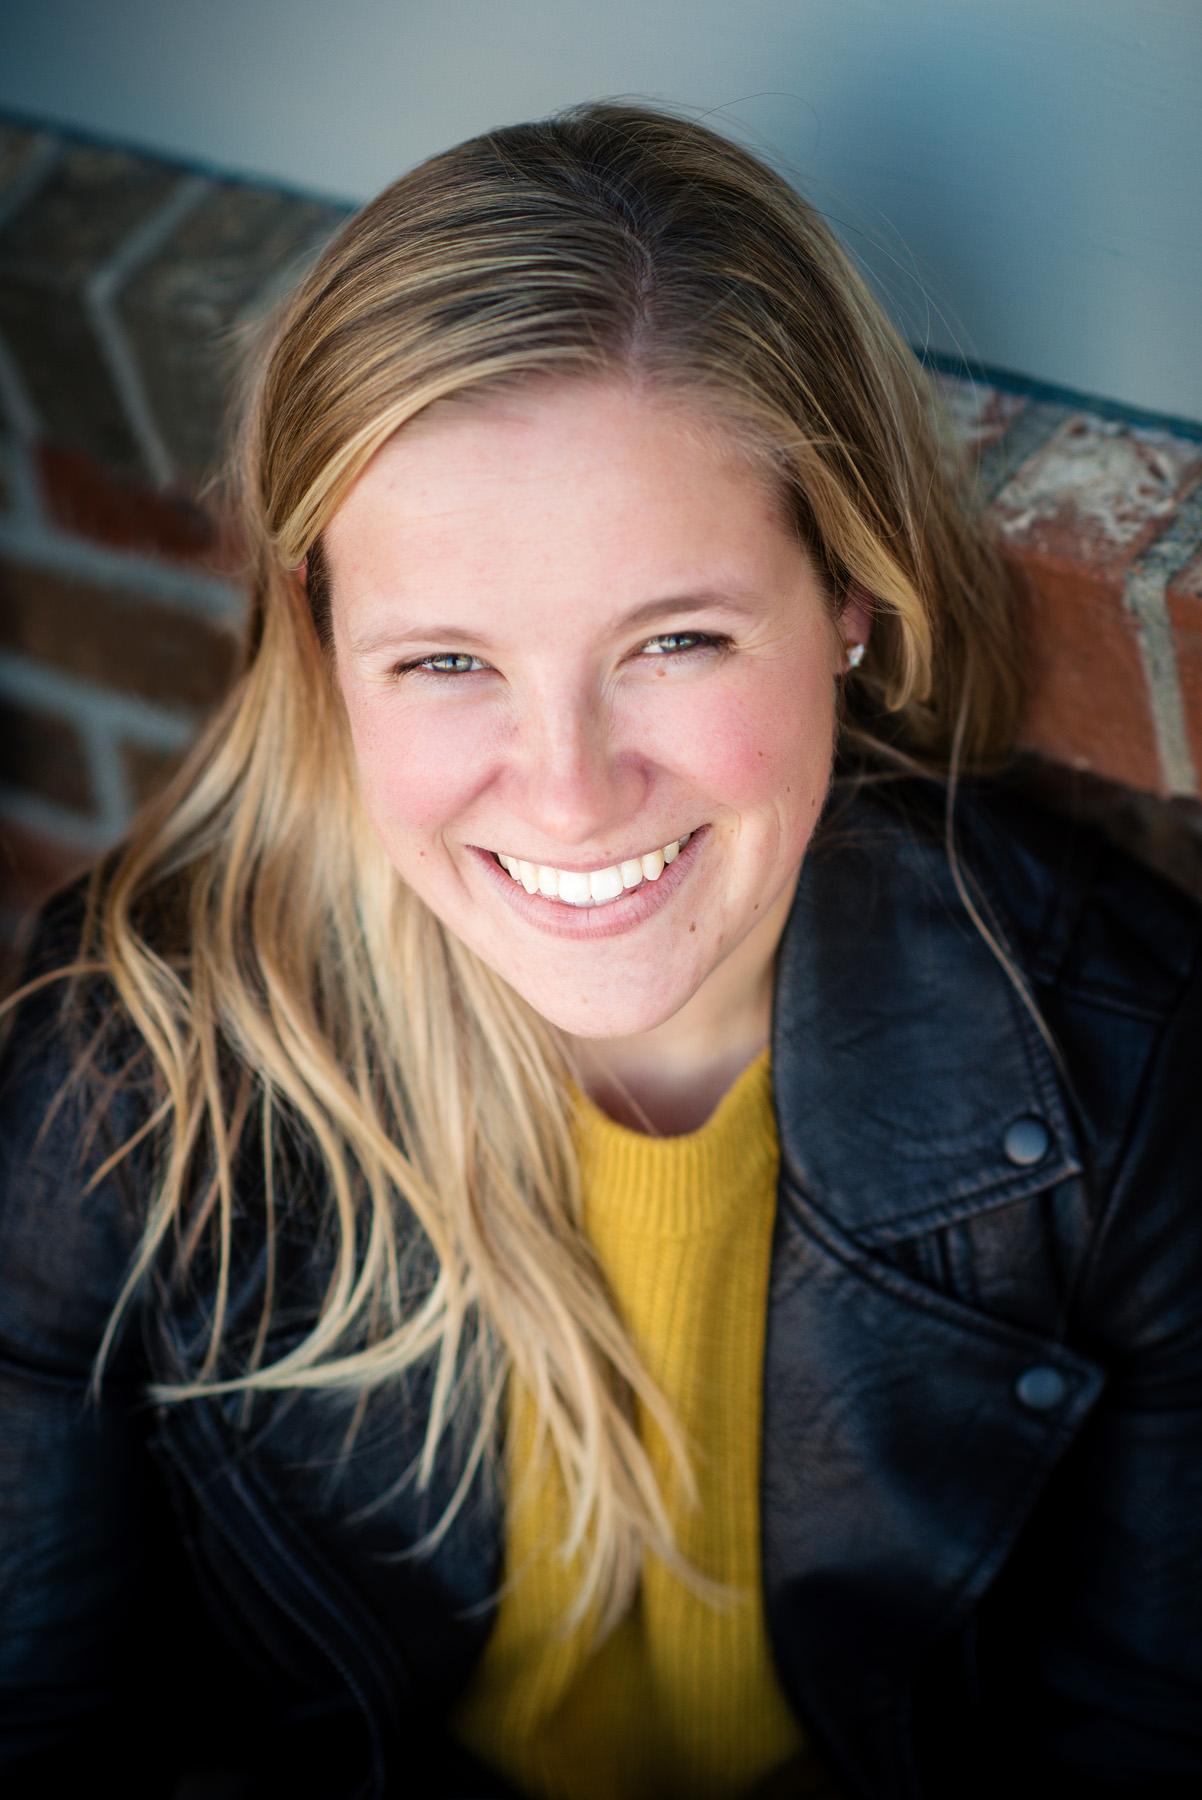 Kelly LaFleur - Lacework Films